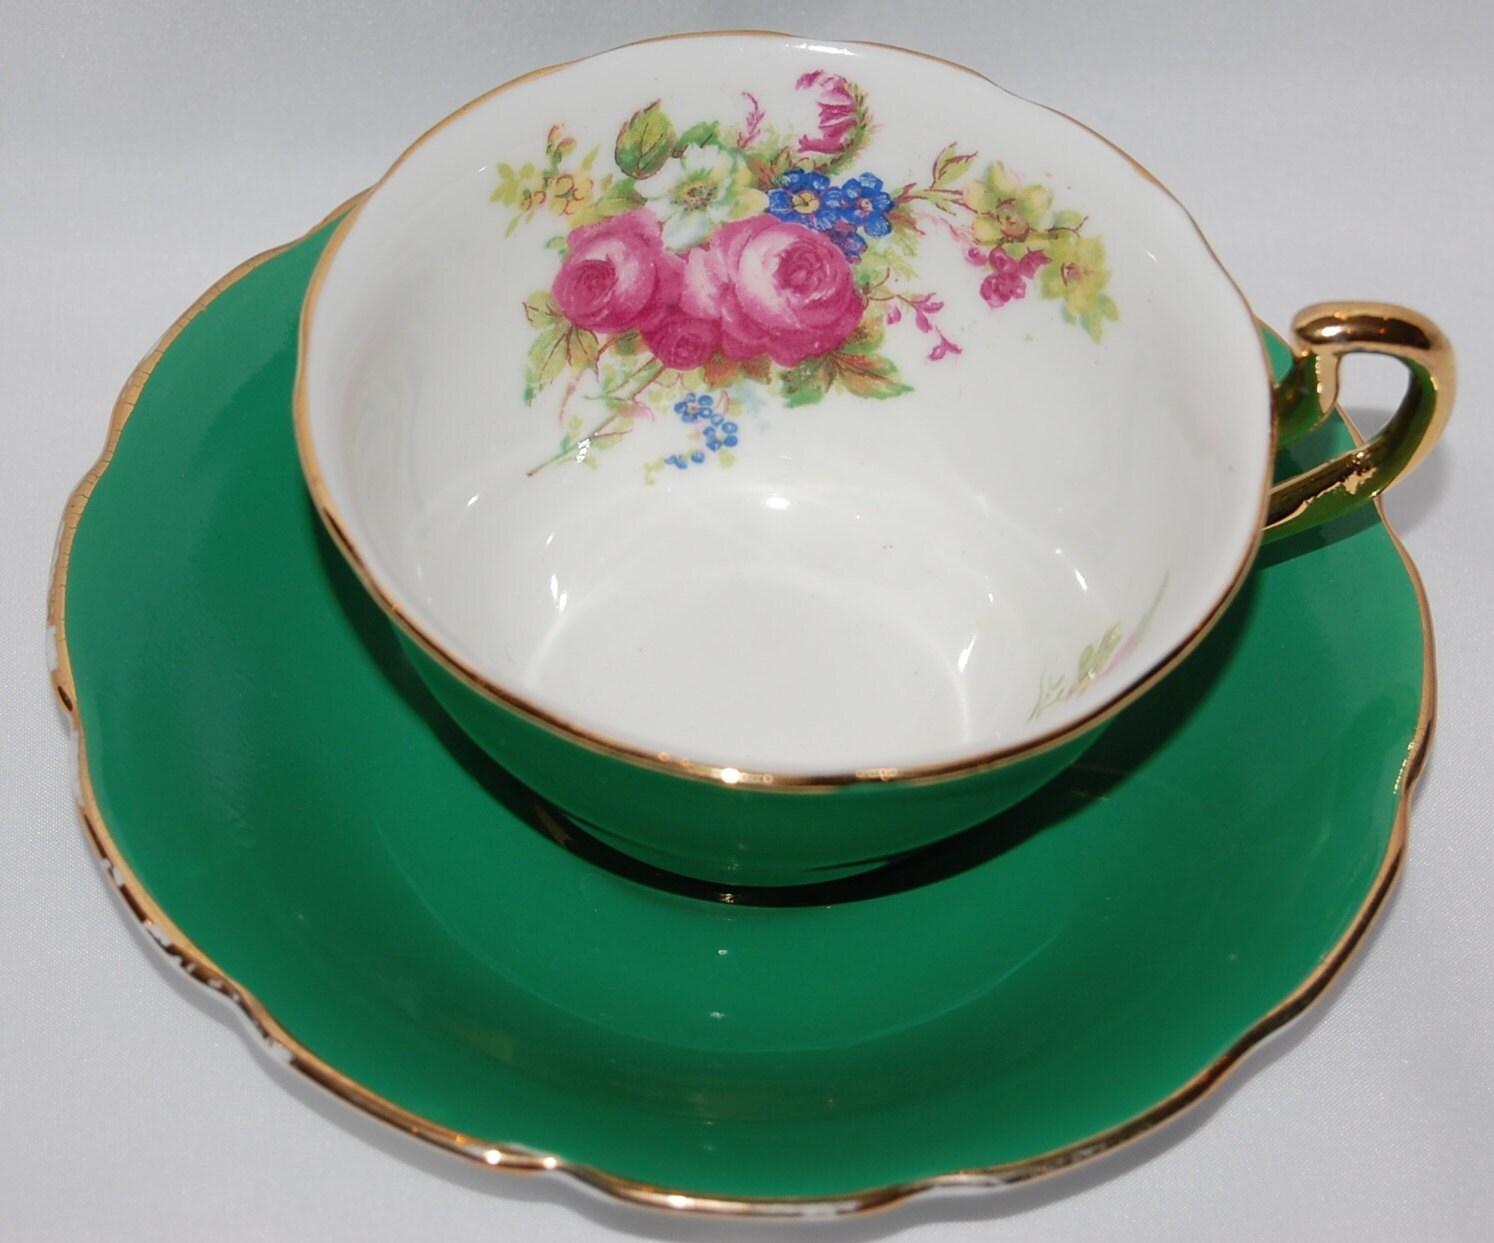 Vanderwood Genuine Bone China Green Tea Cup and Saucer - EfficientsenseFinds